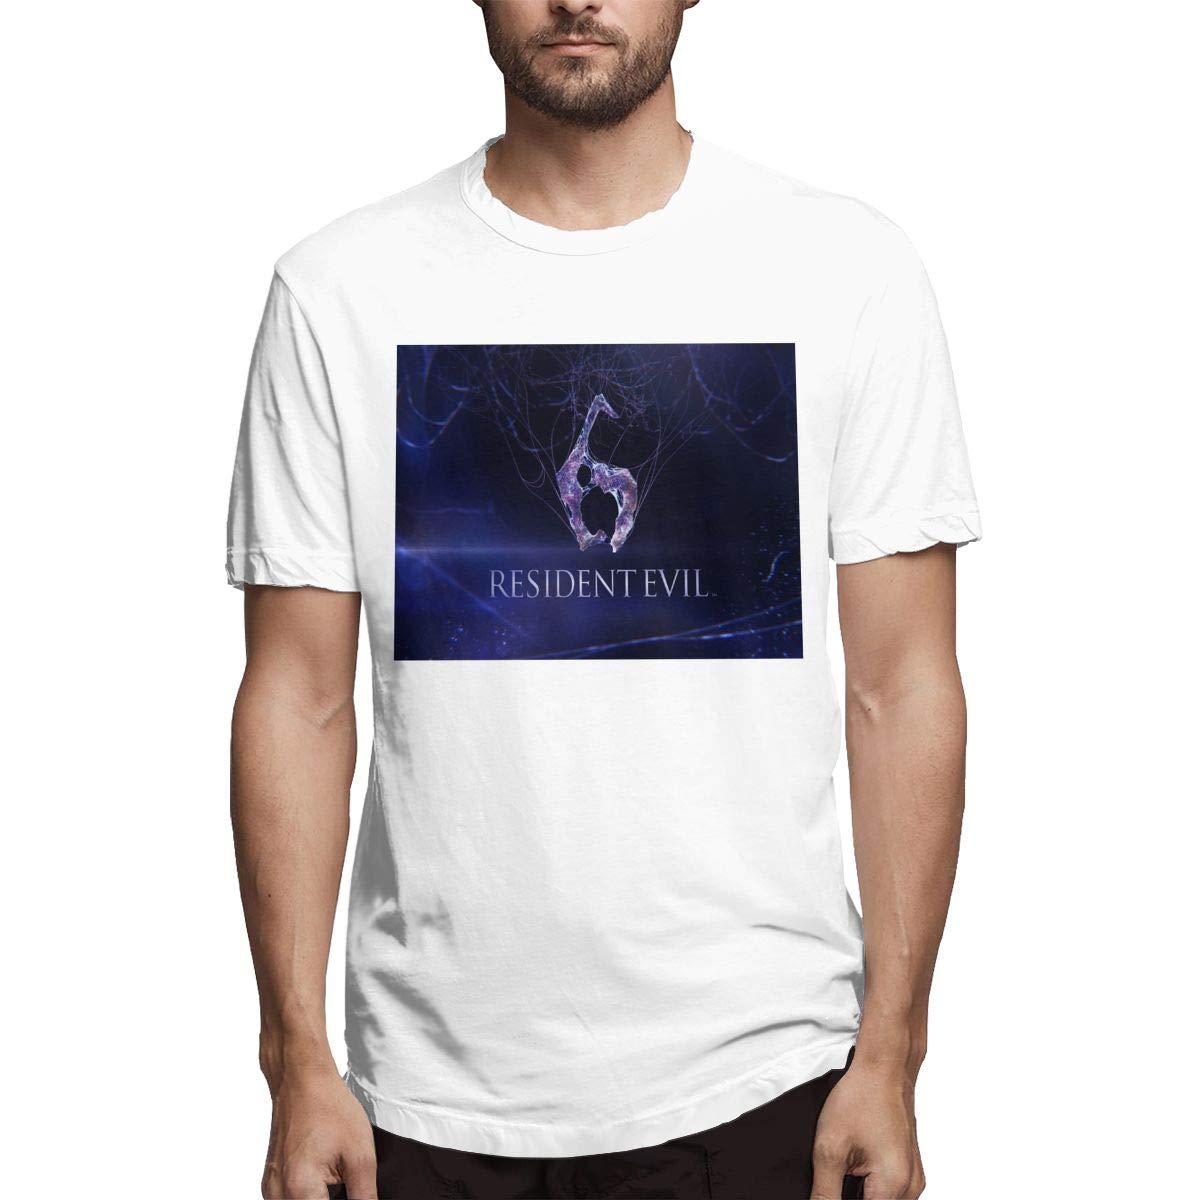 LANBRELLA Resident Evil Men Humor Crew Neck Short Sleeve T Shirt